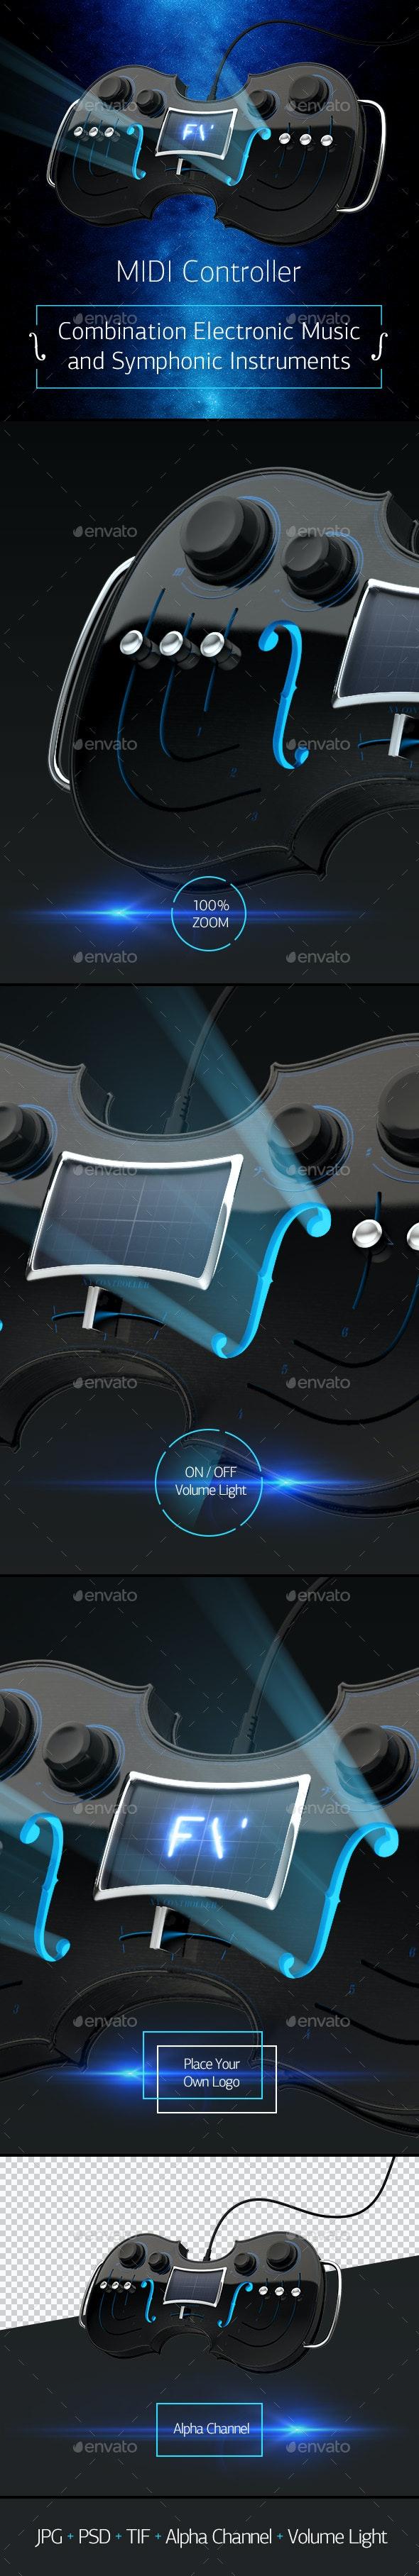 Midi Controller - Technology 3D Renders